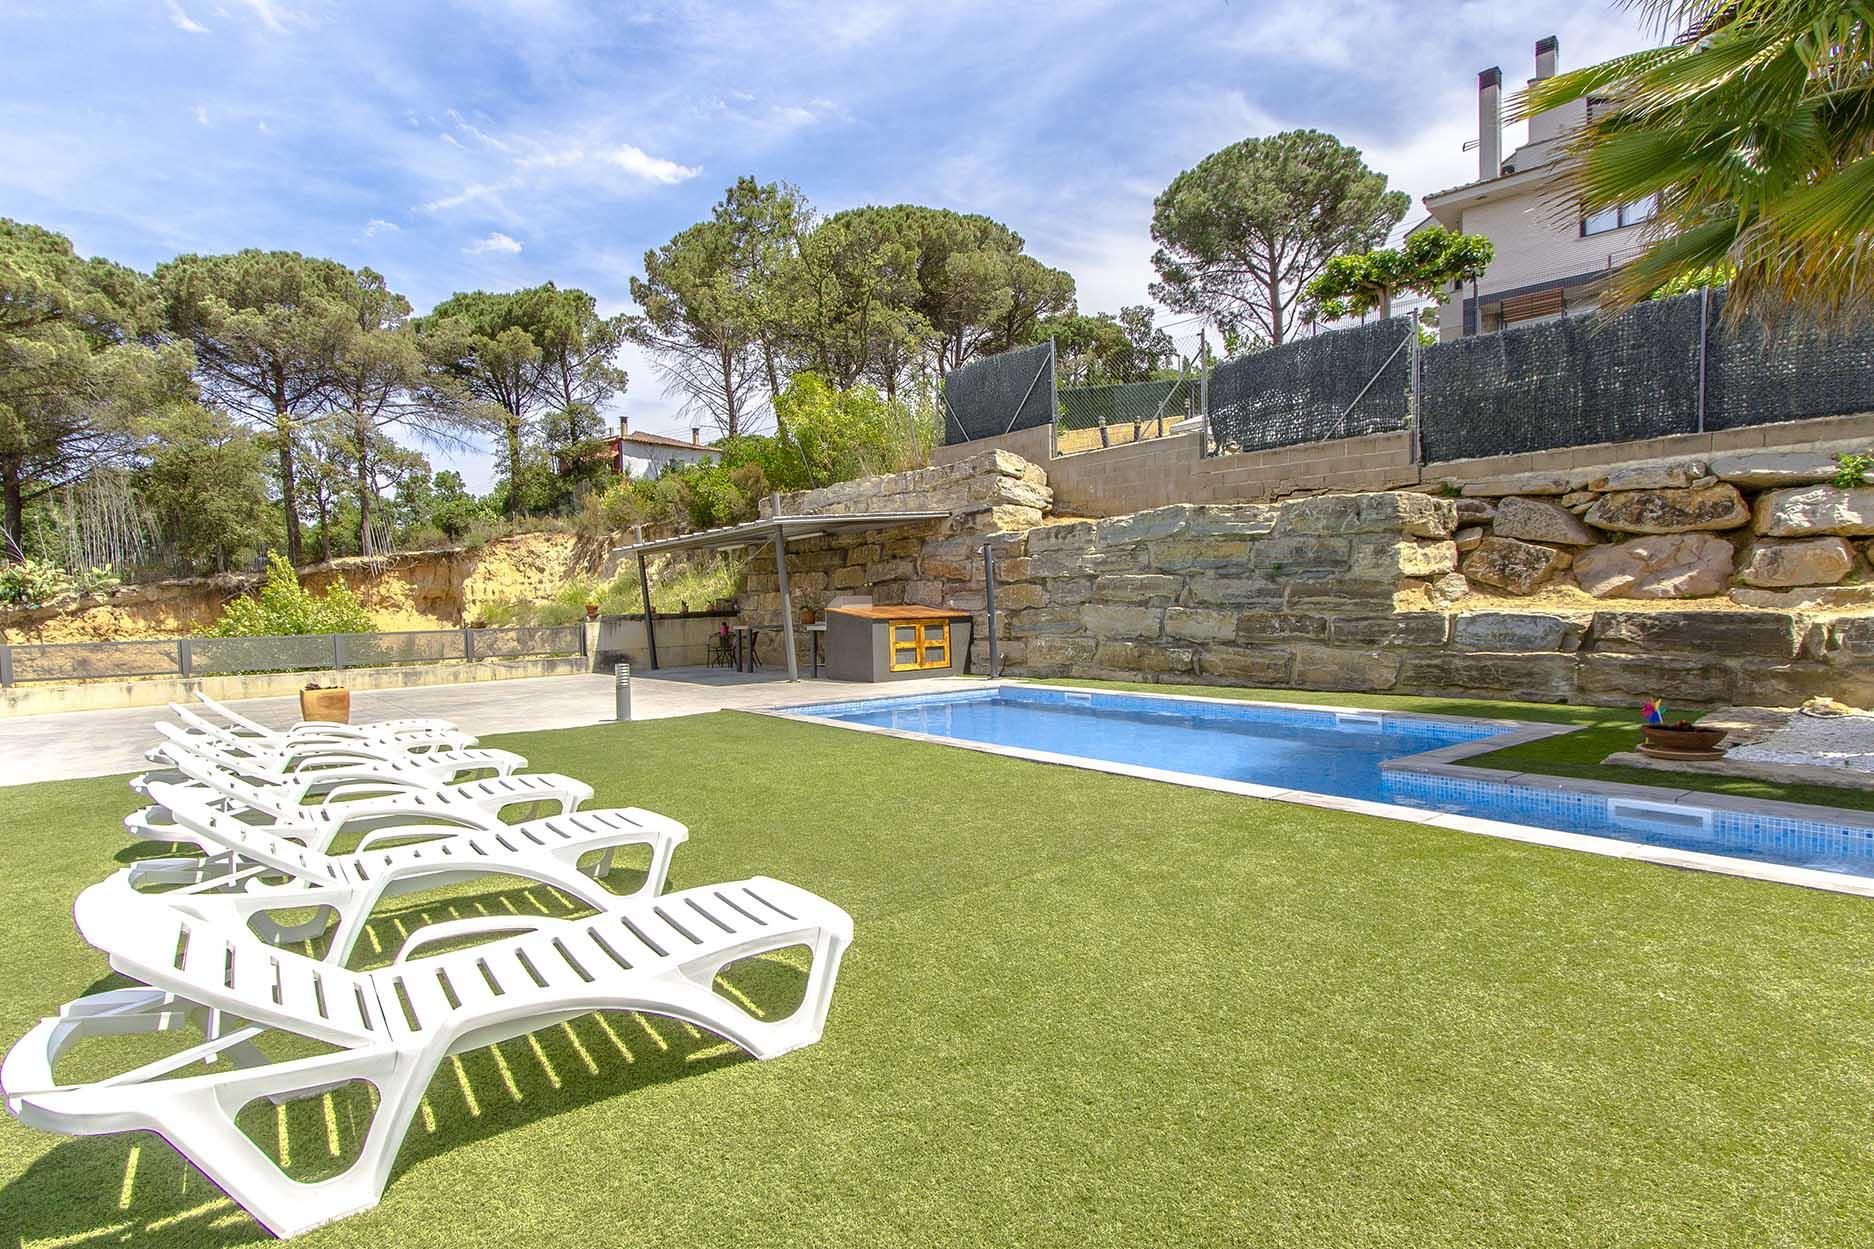 Ferienhaus Catalunya Casas: Modern villa in Sils, 15 min drive to Costa Brava beaches! (1902227), Les Mallorquines, Girona, Katalonien, Spanien, Bild 7